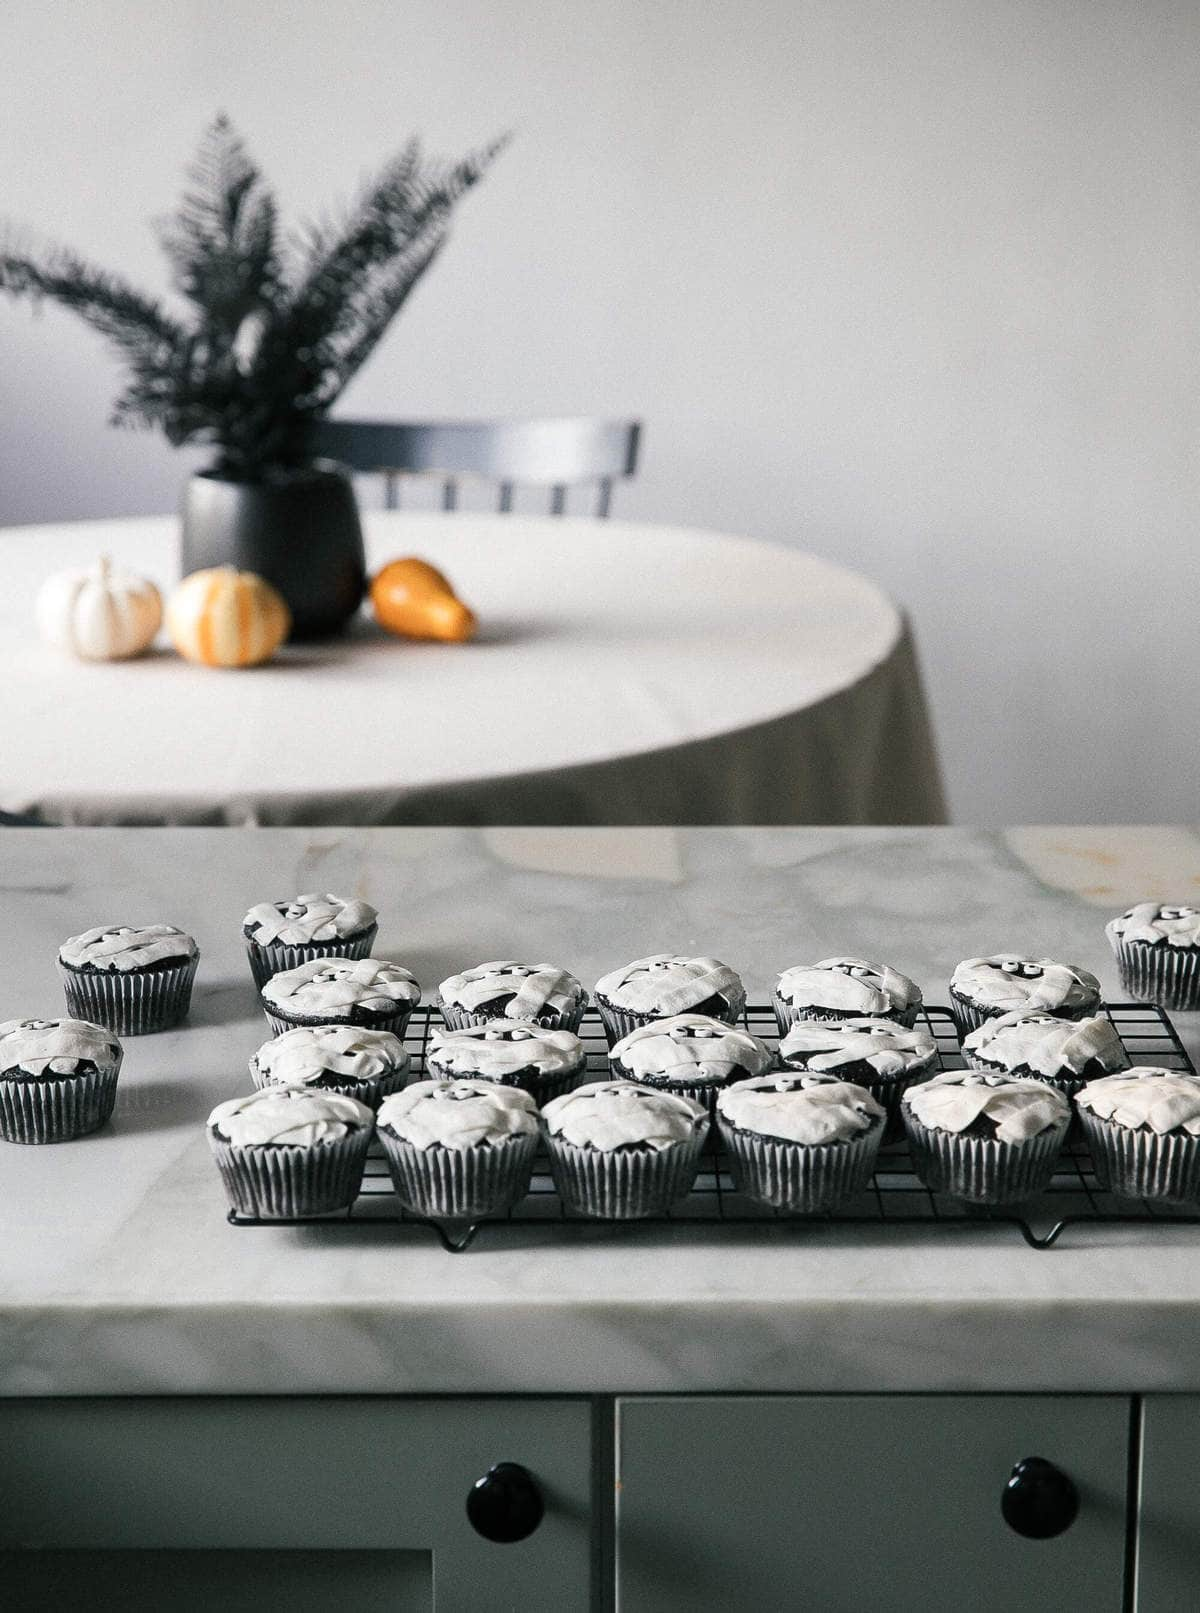 Mummy Dark Chocolate Cupcakes